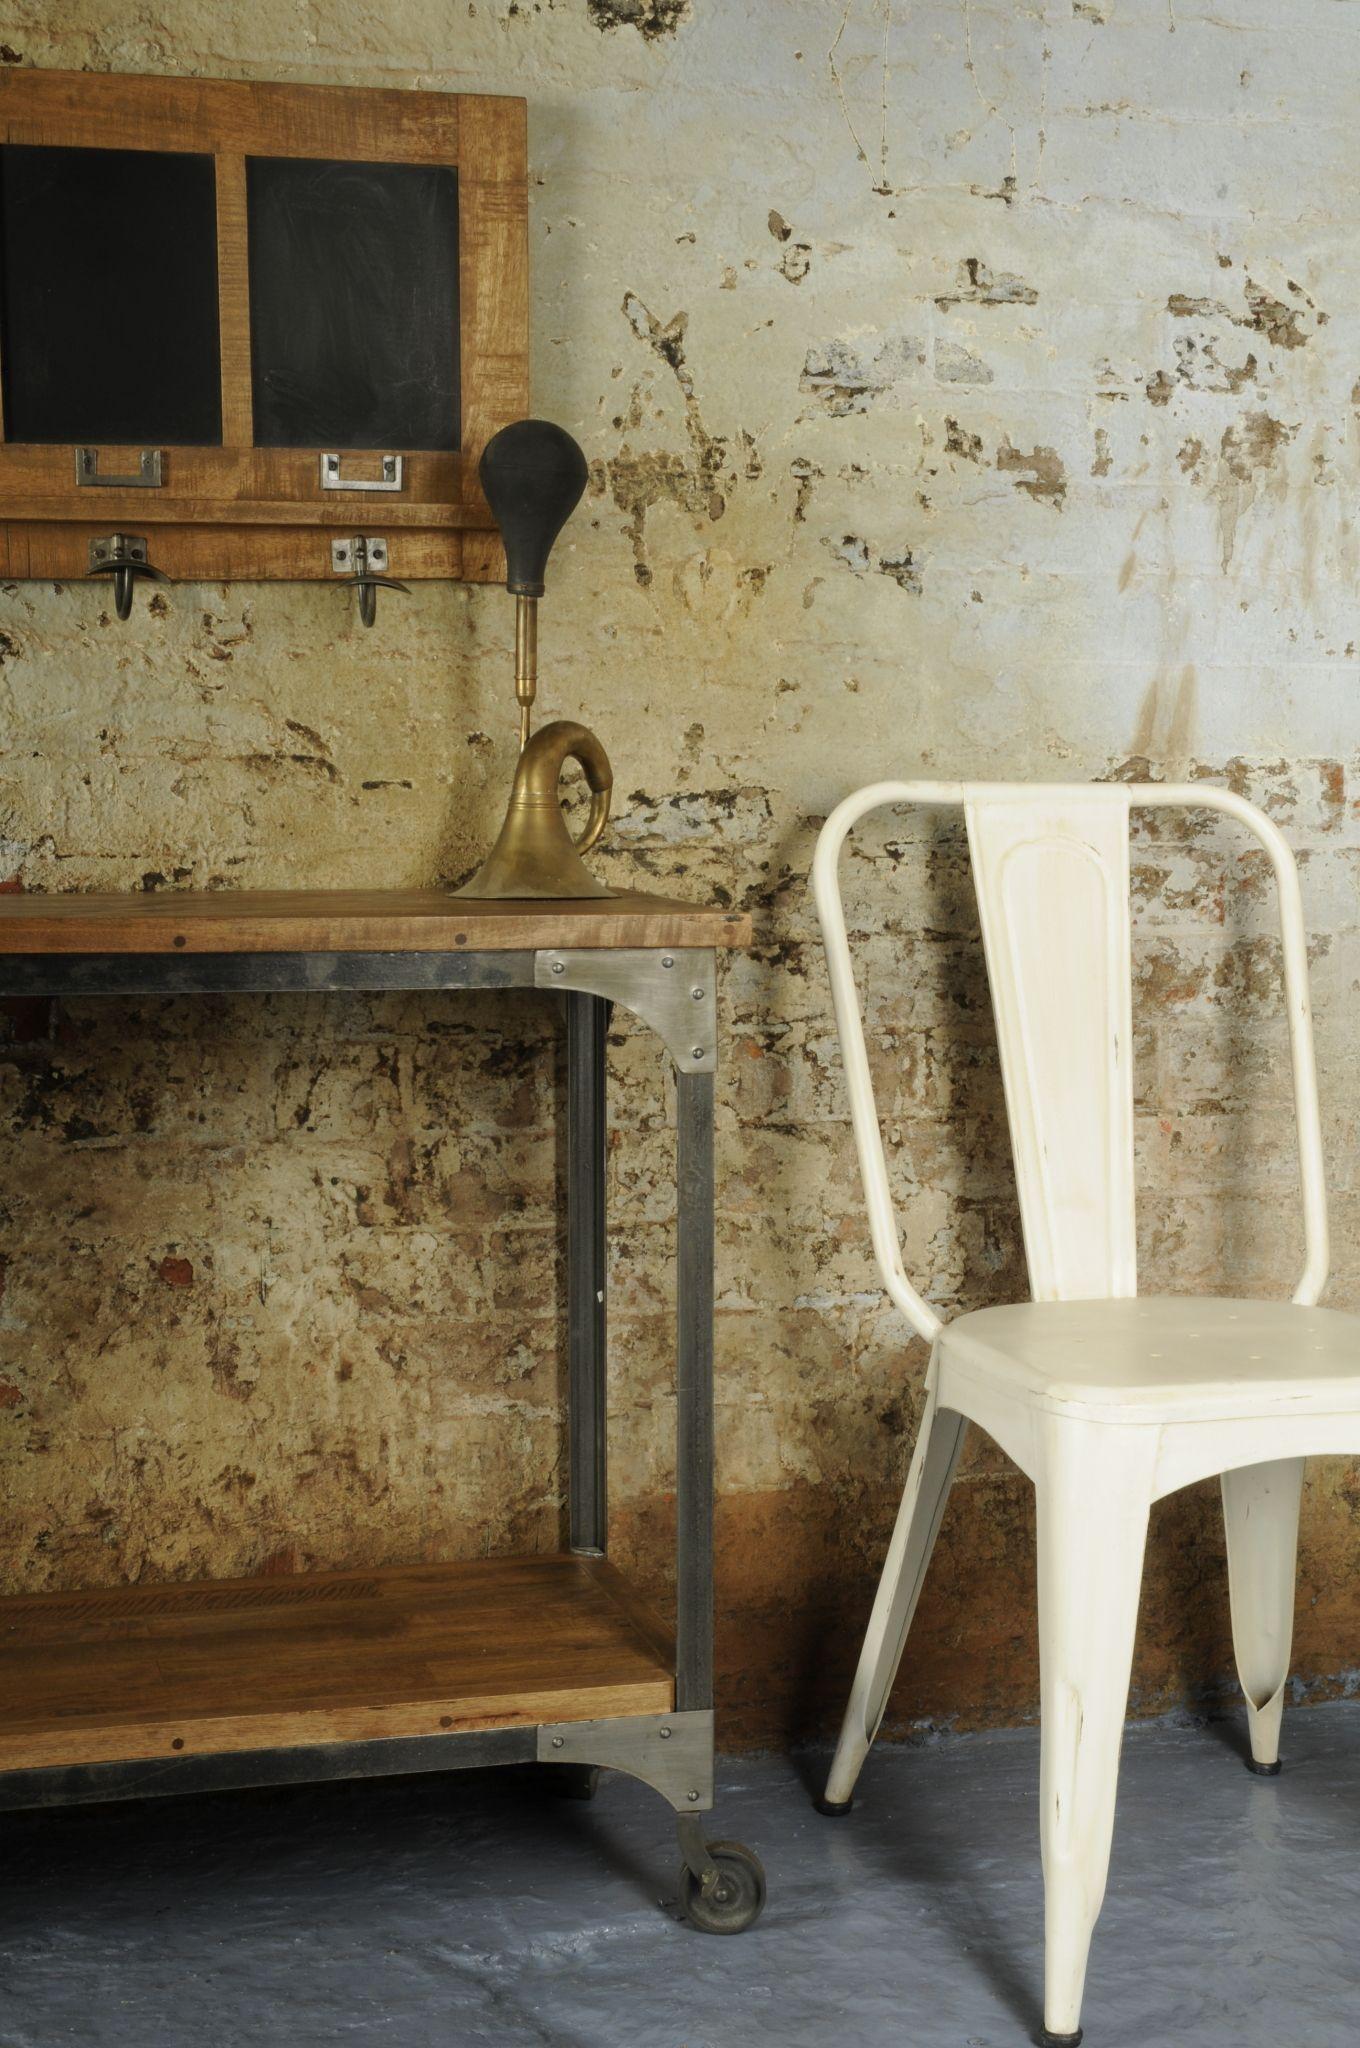 urban rustic furniture. Urban Rustic Chic Furniture Available On Our Website Www.uniquechicfurniture.co.uk F